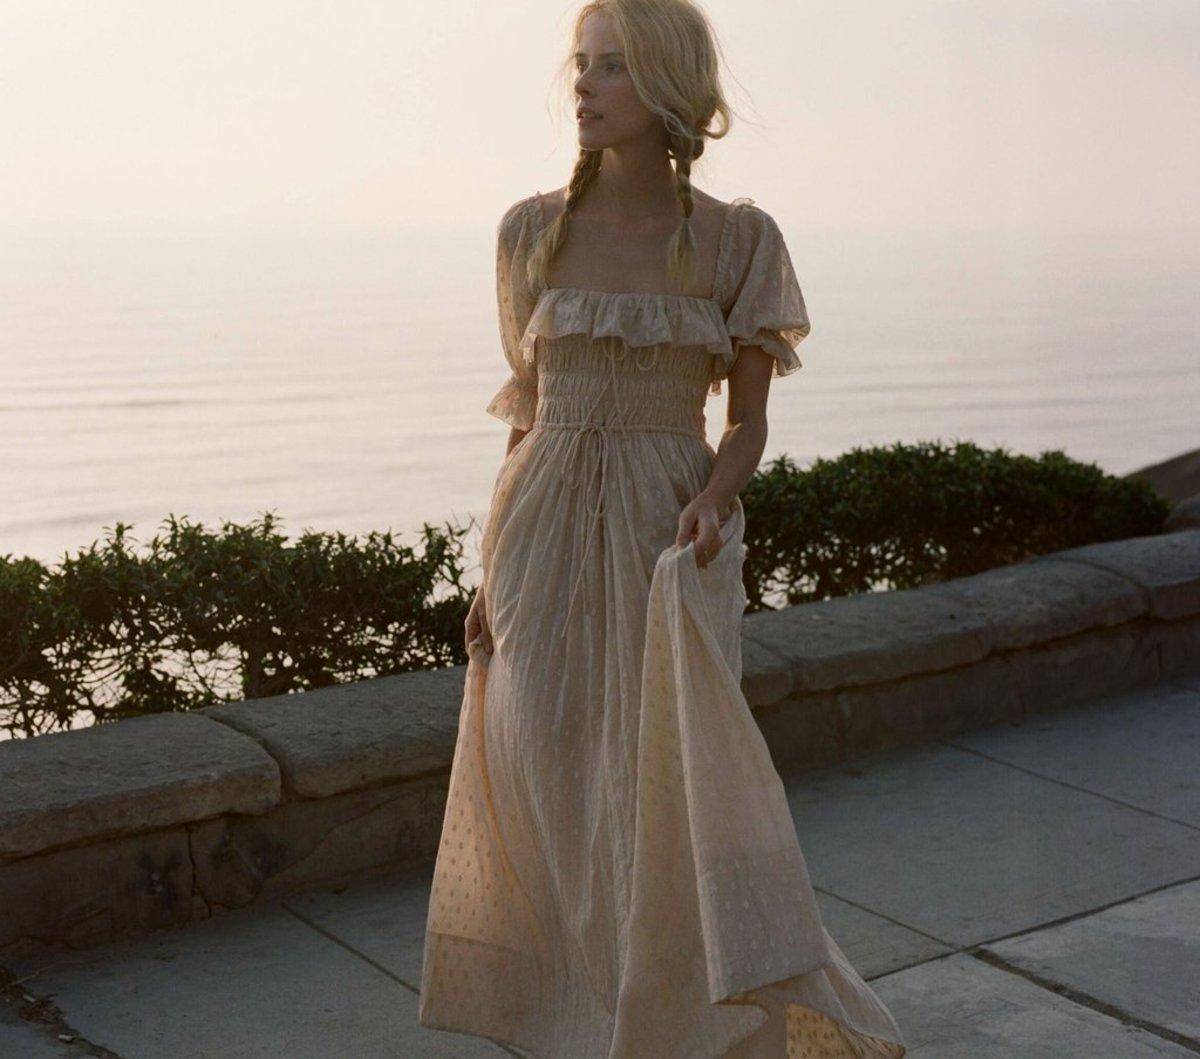 Dôen Sol Dress, $305, available at Dôen